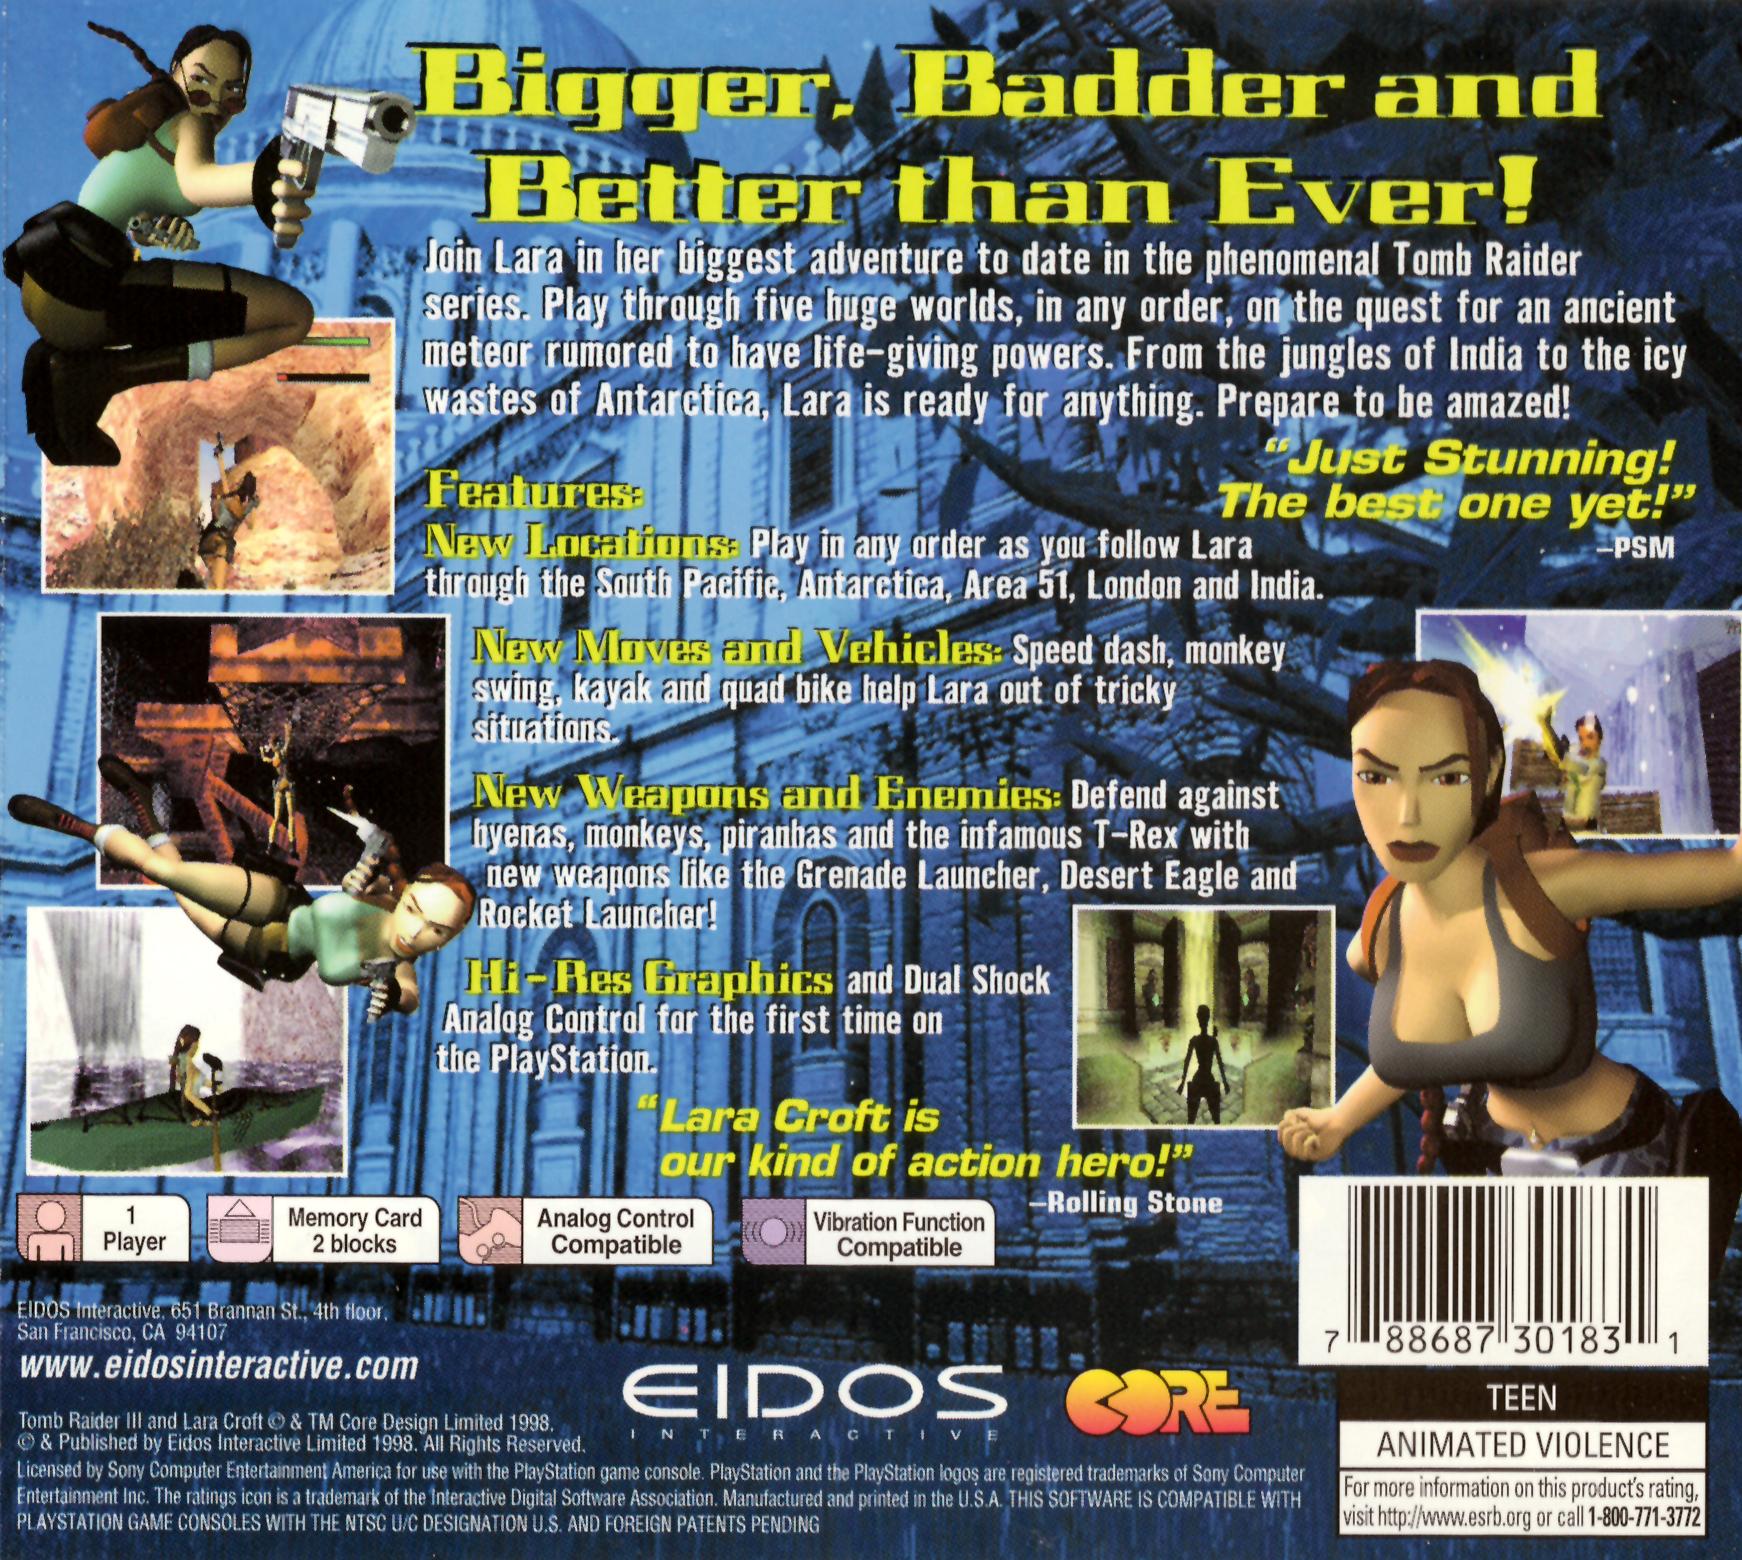 Tomb Rider Wallpaper: Tomb Raider III: Adventures Of Lara Croft Details